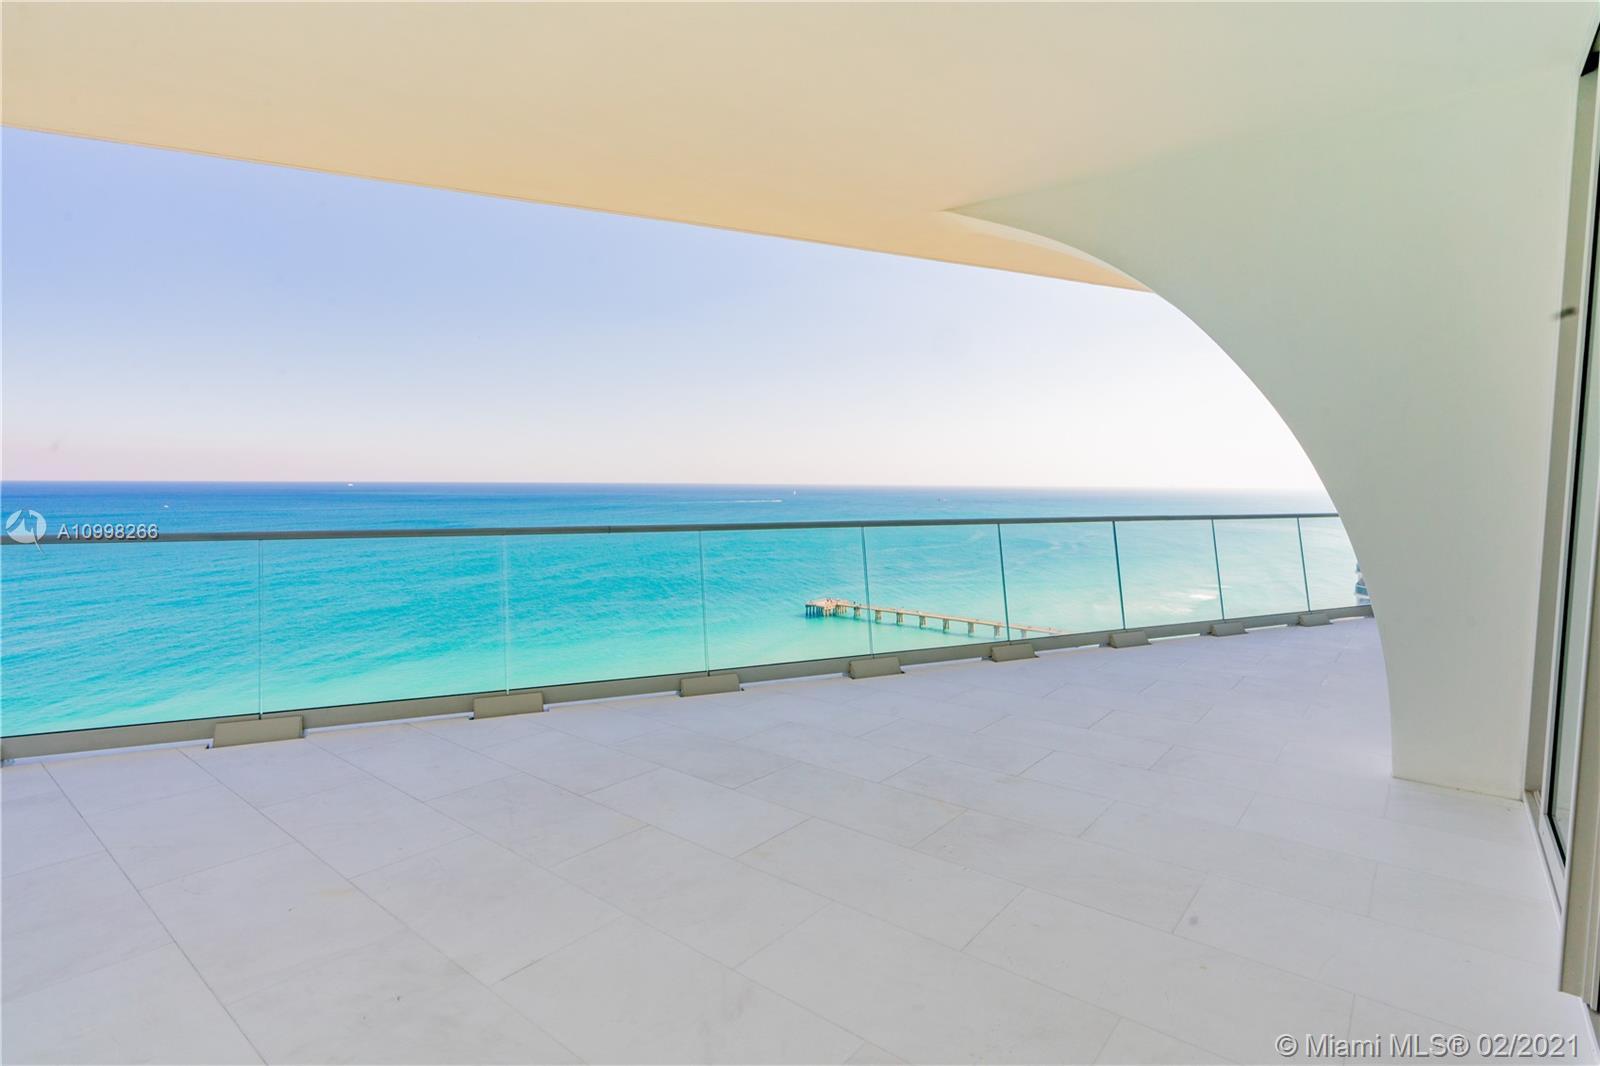 Jade Signature #2003 - 16901 COLLINS #2003, Sunny Isles Beach, FL 33160